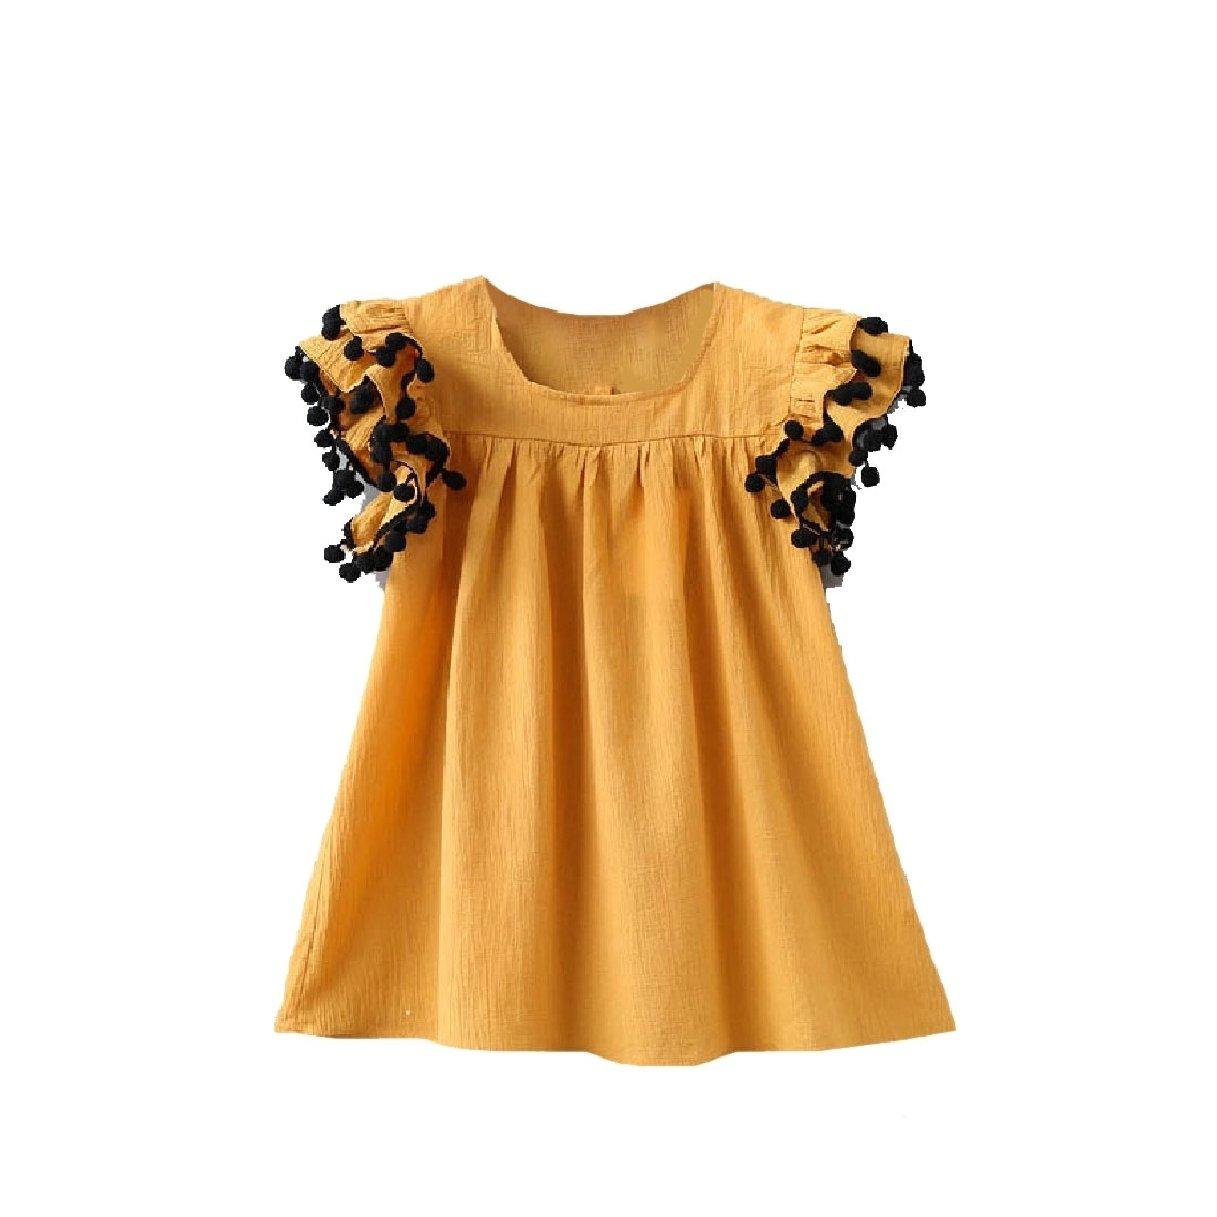 Zago Big Little Girl Solid Fine Cotton Round Collar Flounced Dresses Yellow 110